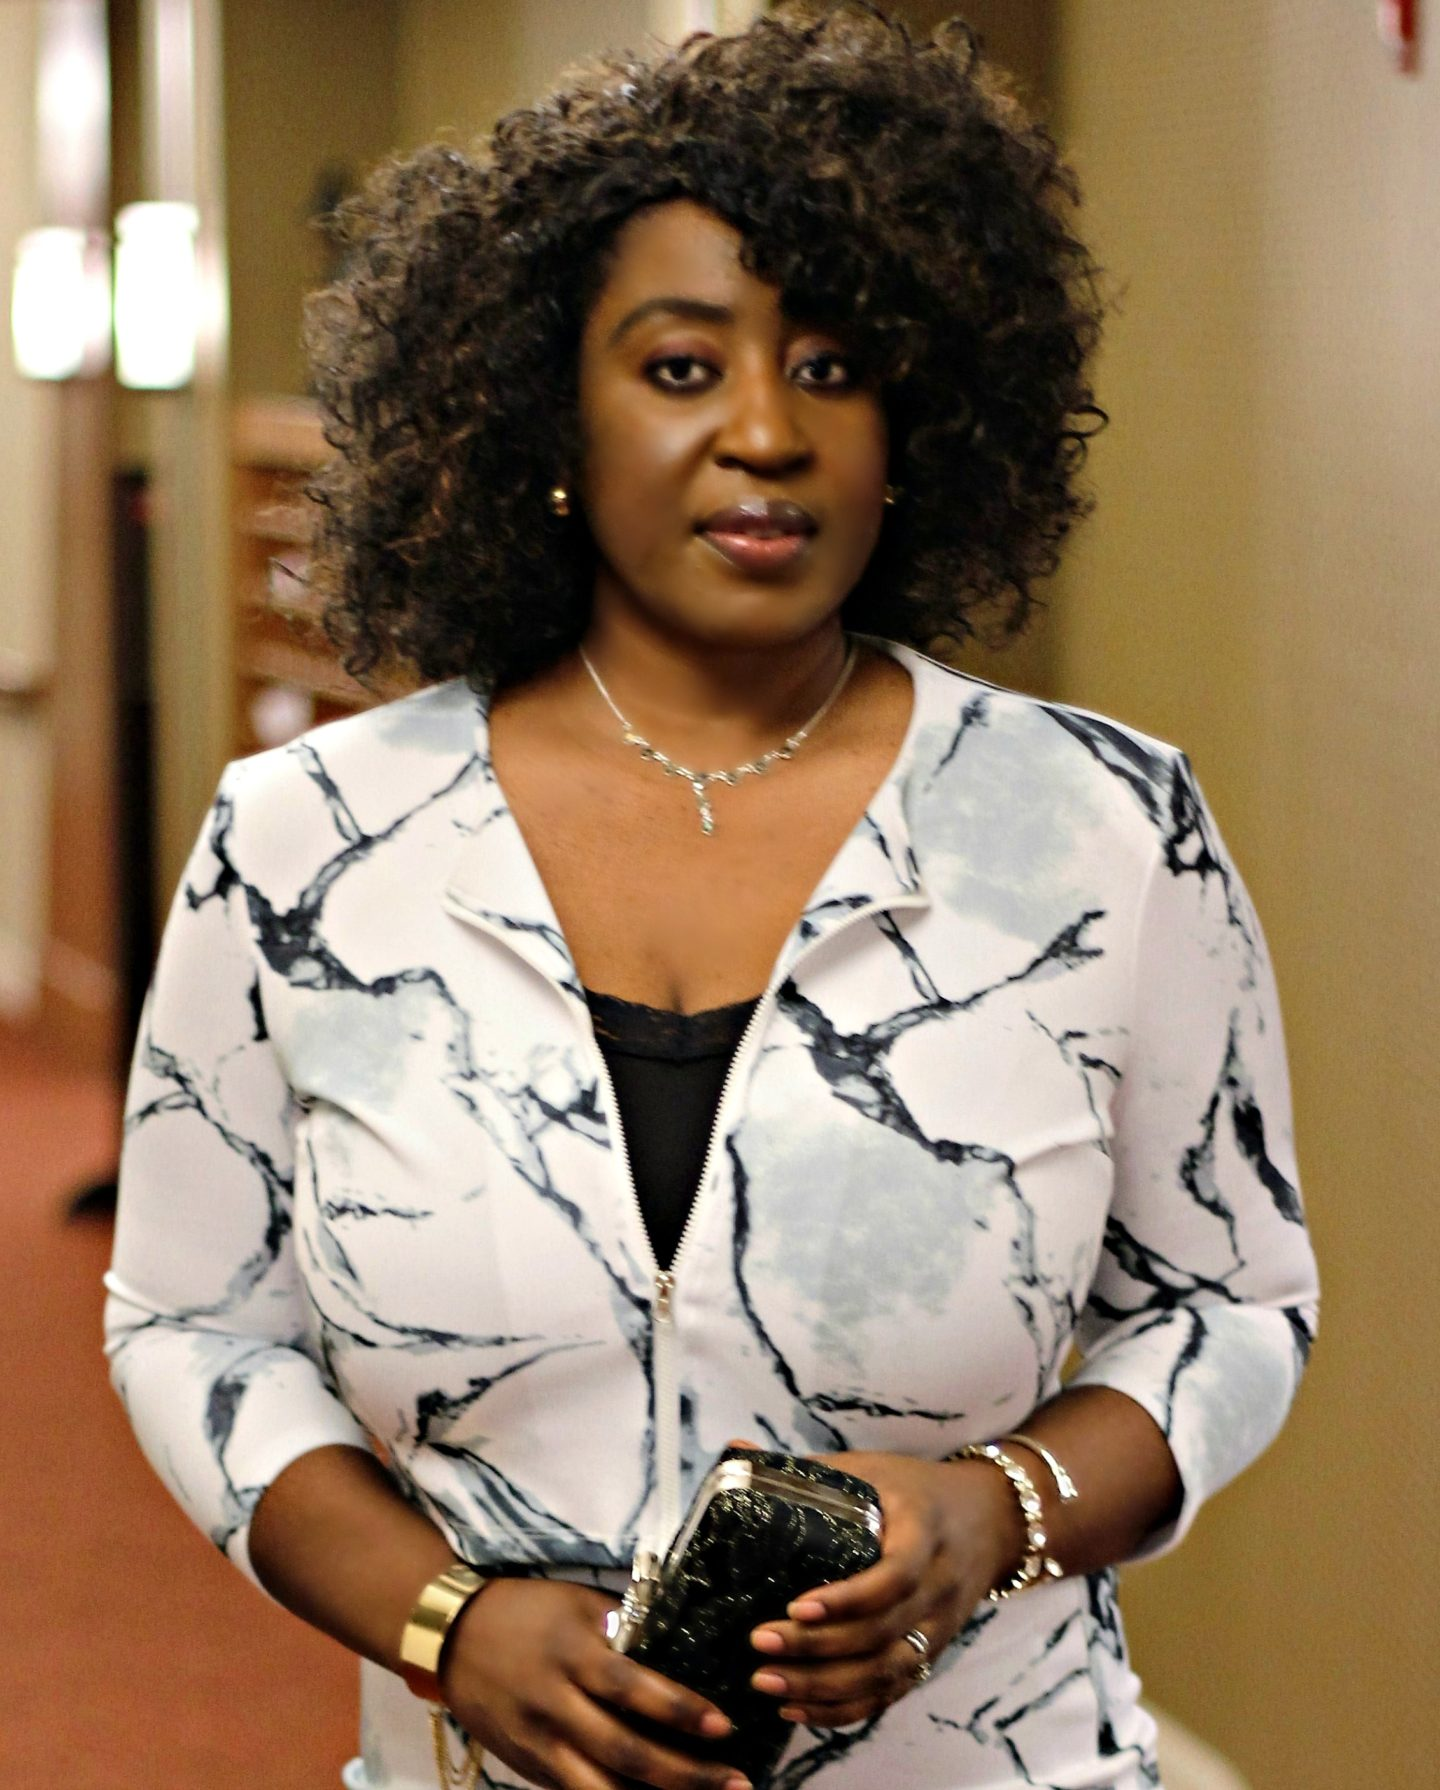 beautiful-black-woman-with-curly-hair-crop-top-skirt-set1jpg